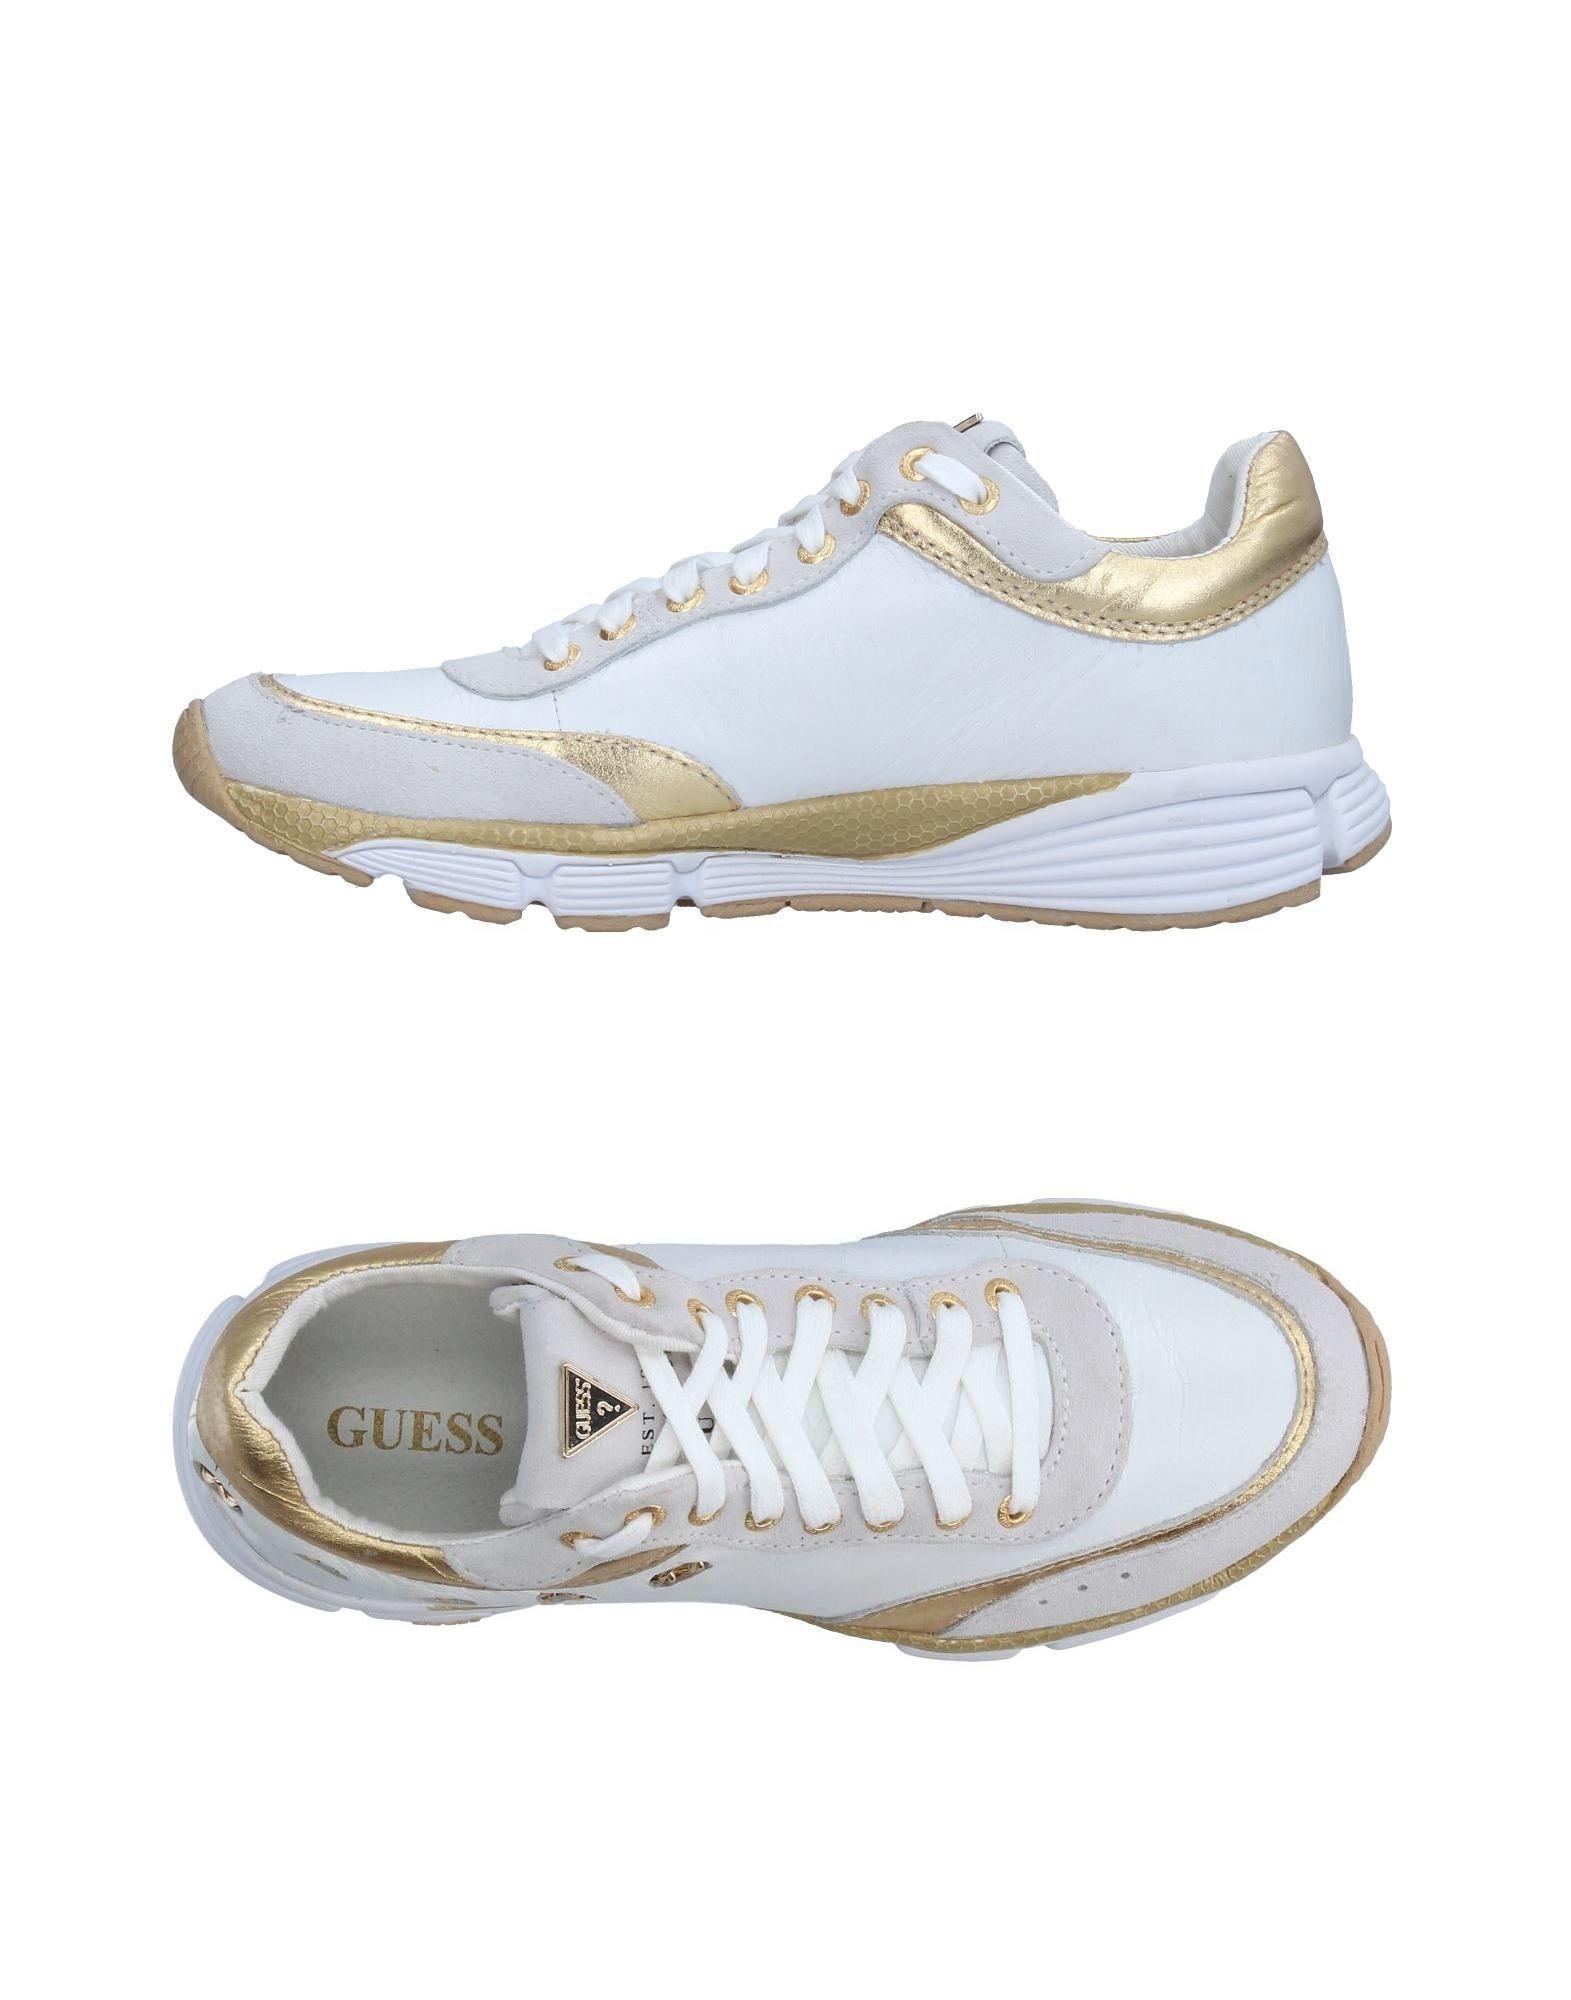 A buon mercato Sneakers Guess Donna - 11326068BU